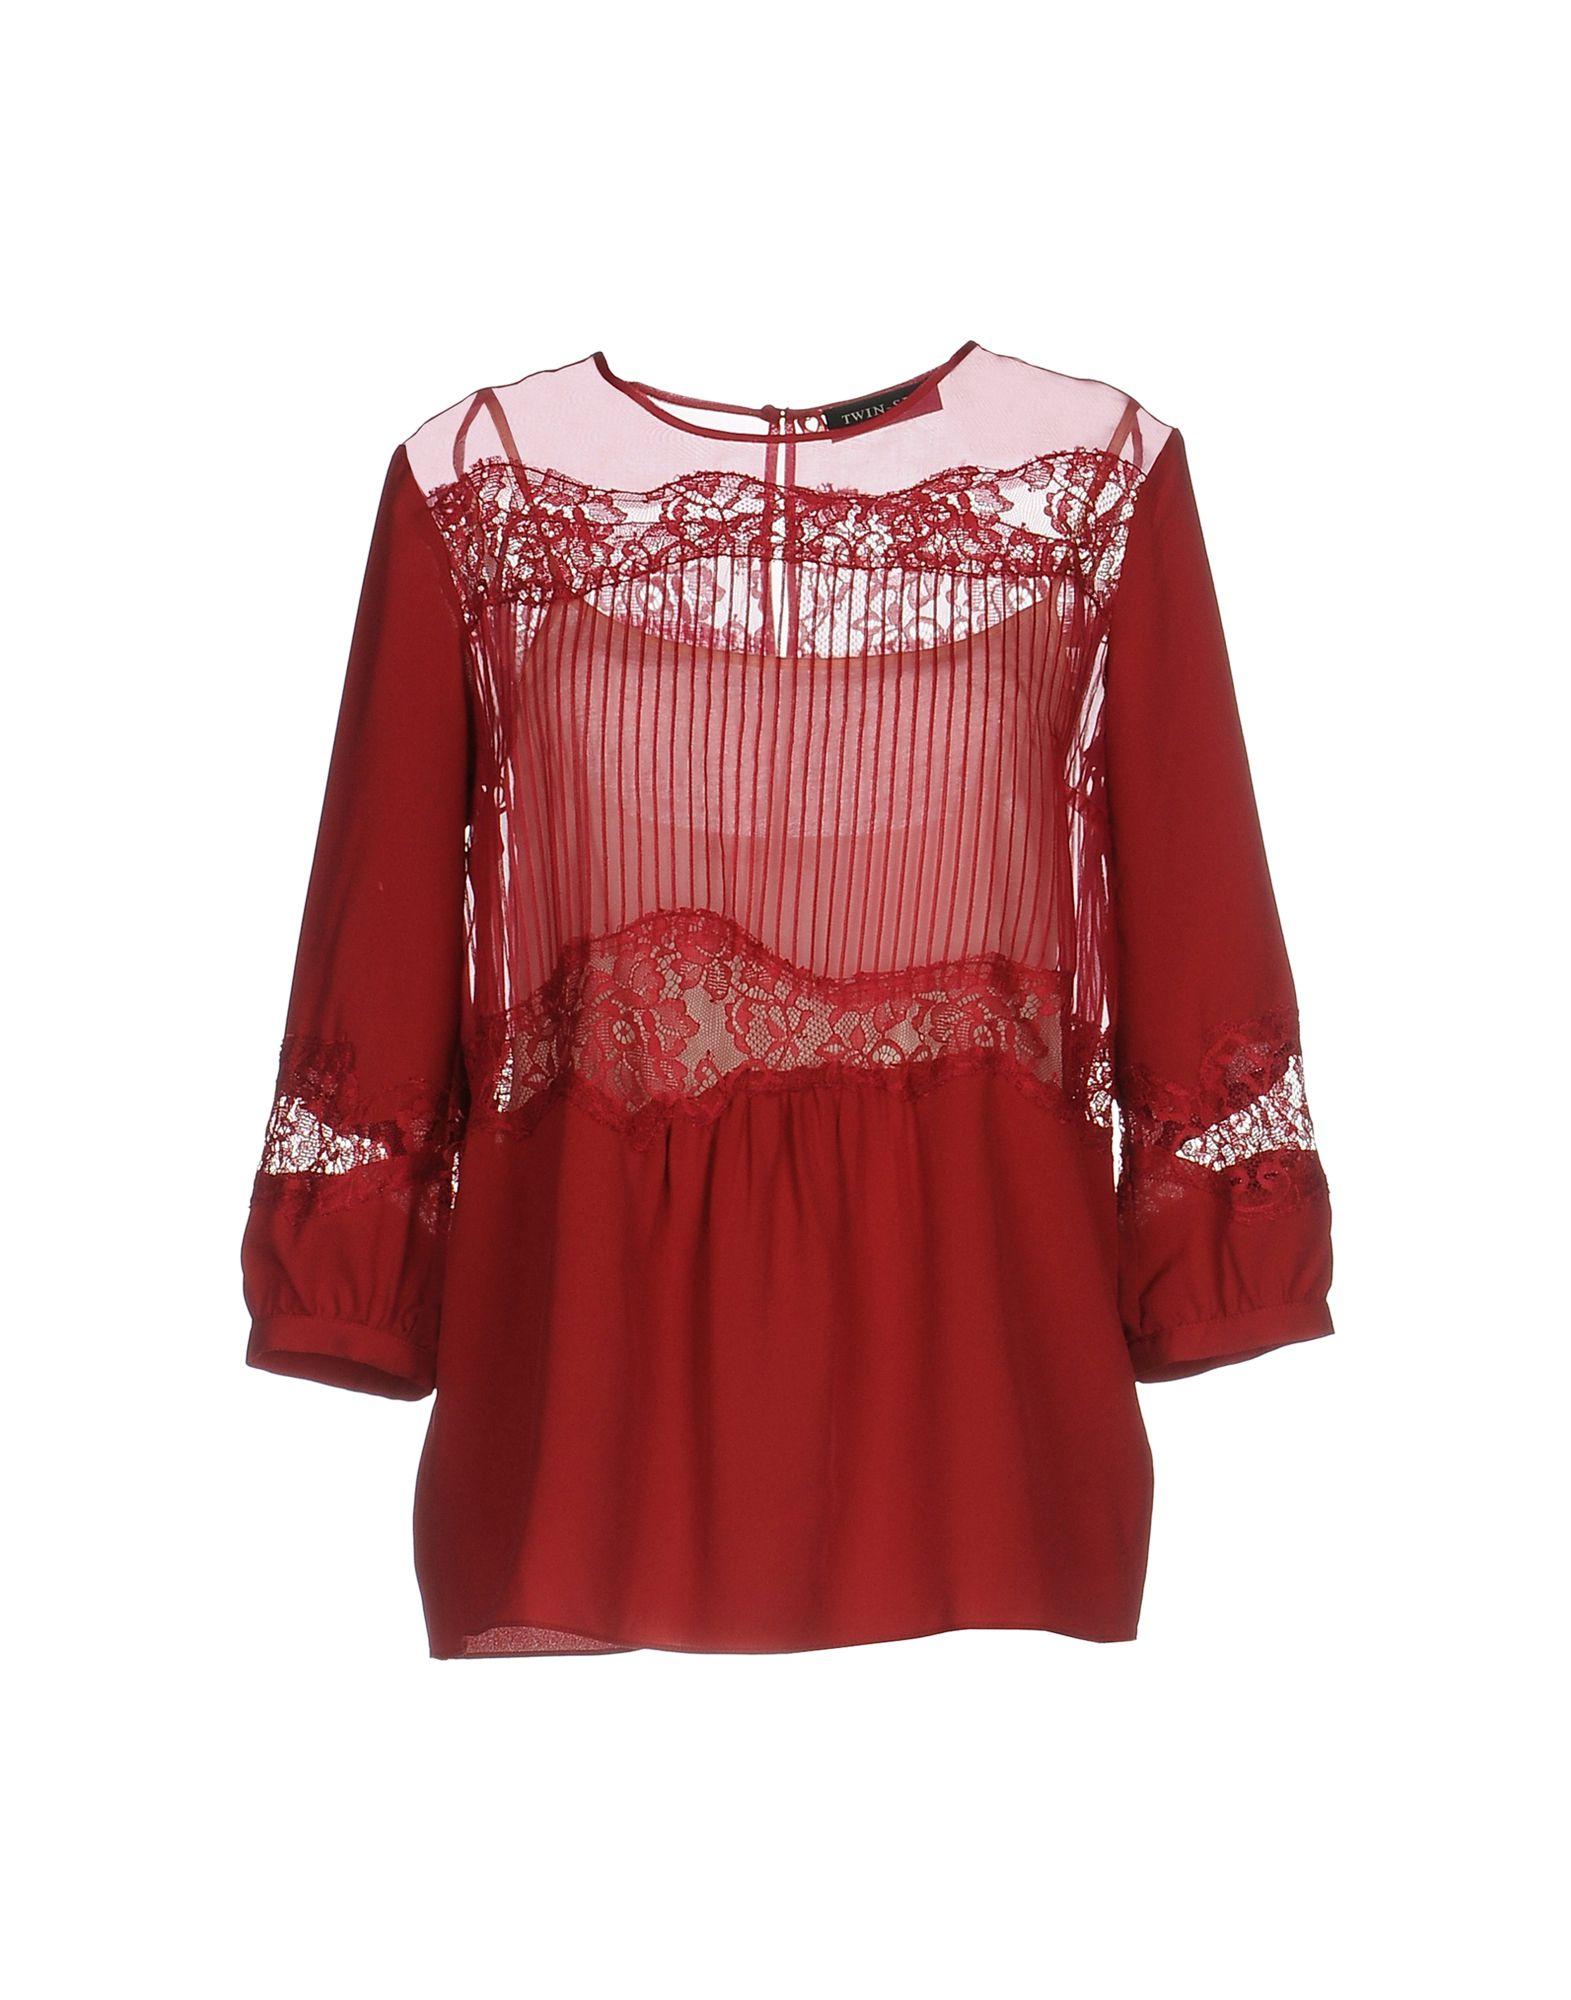 TWIN-SET Simona Barbieri Блузка twin set блузка комплект twin set p29270 2buy серый l